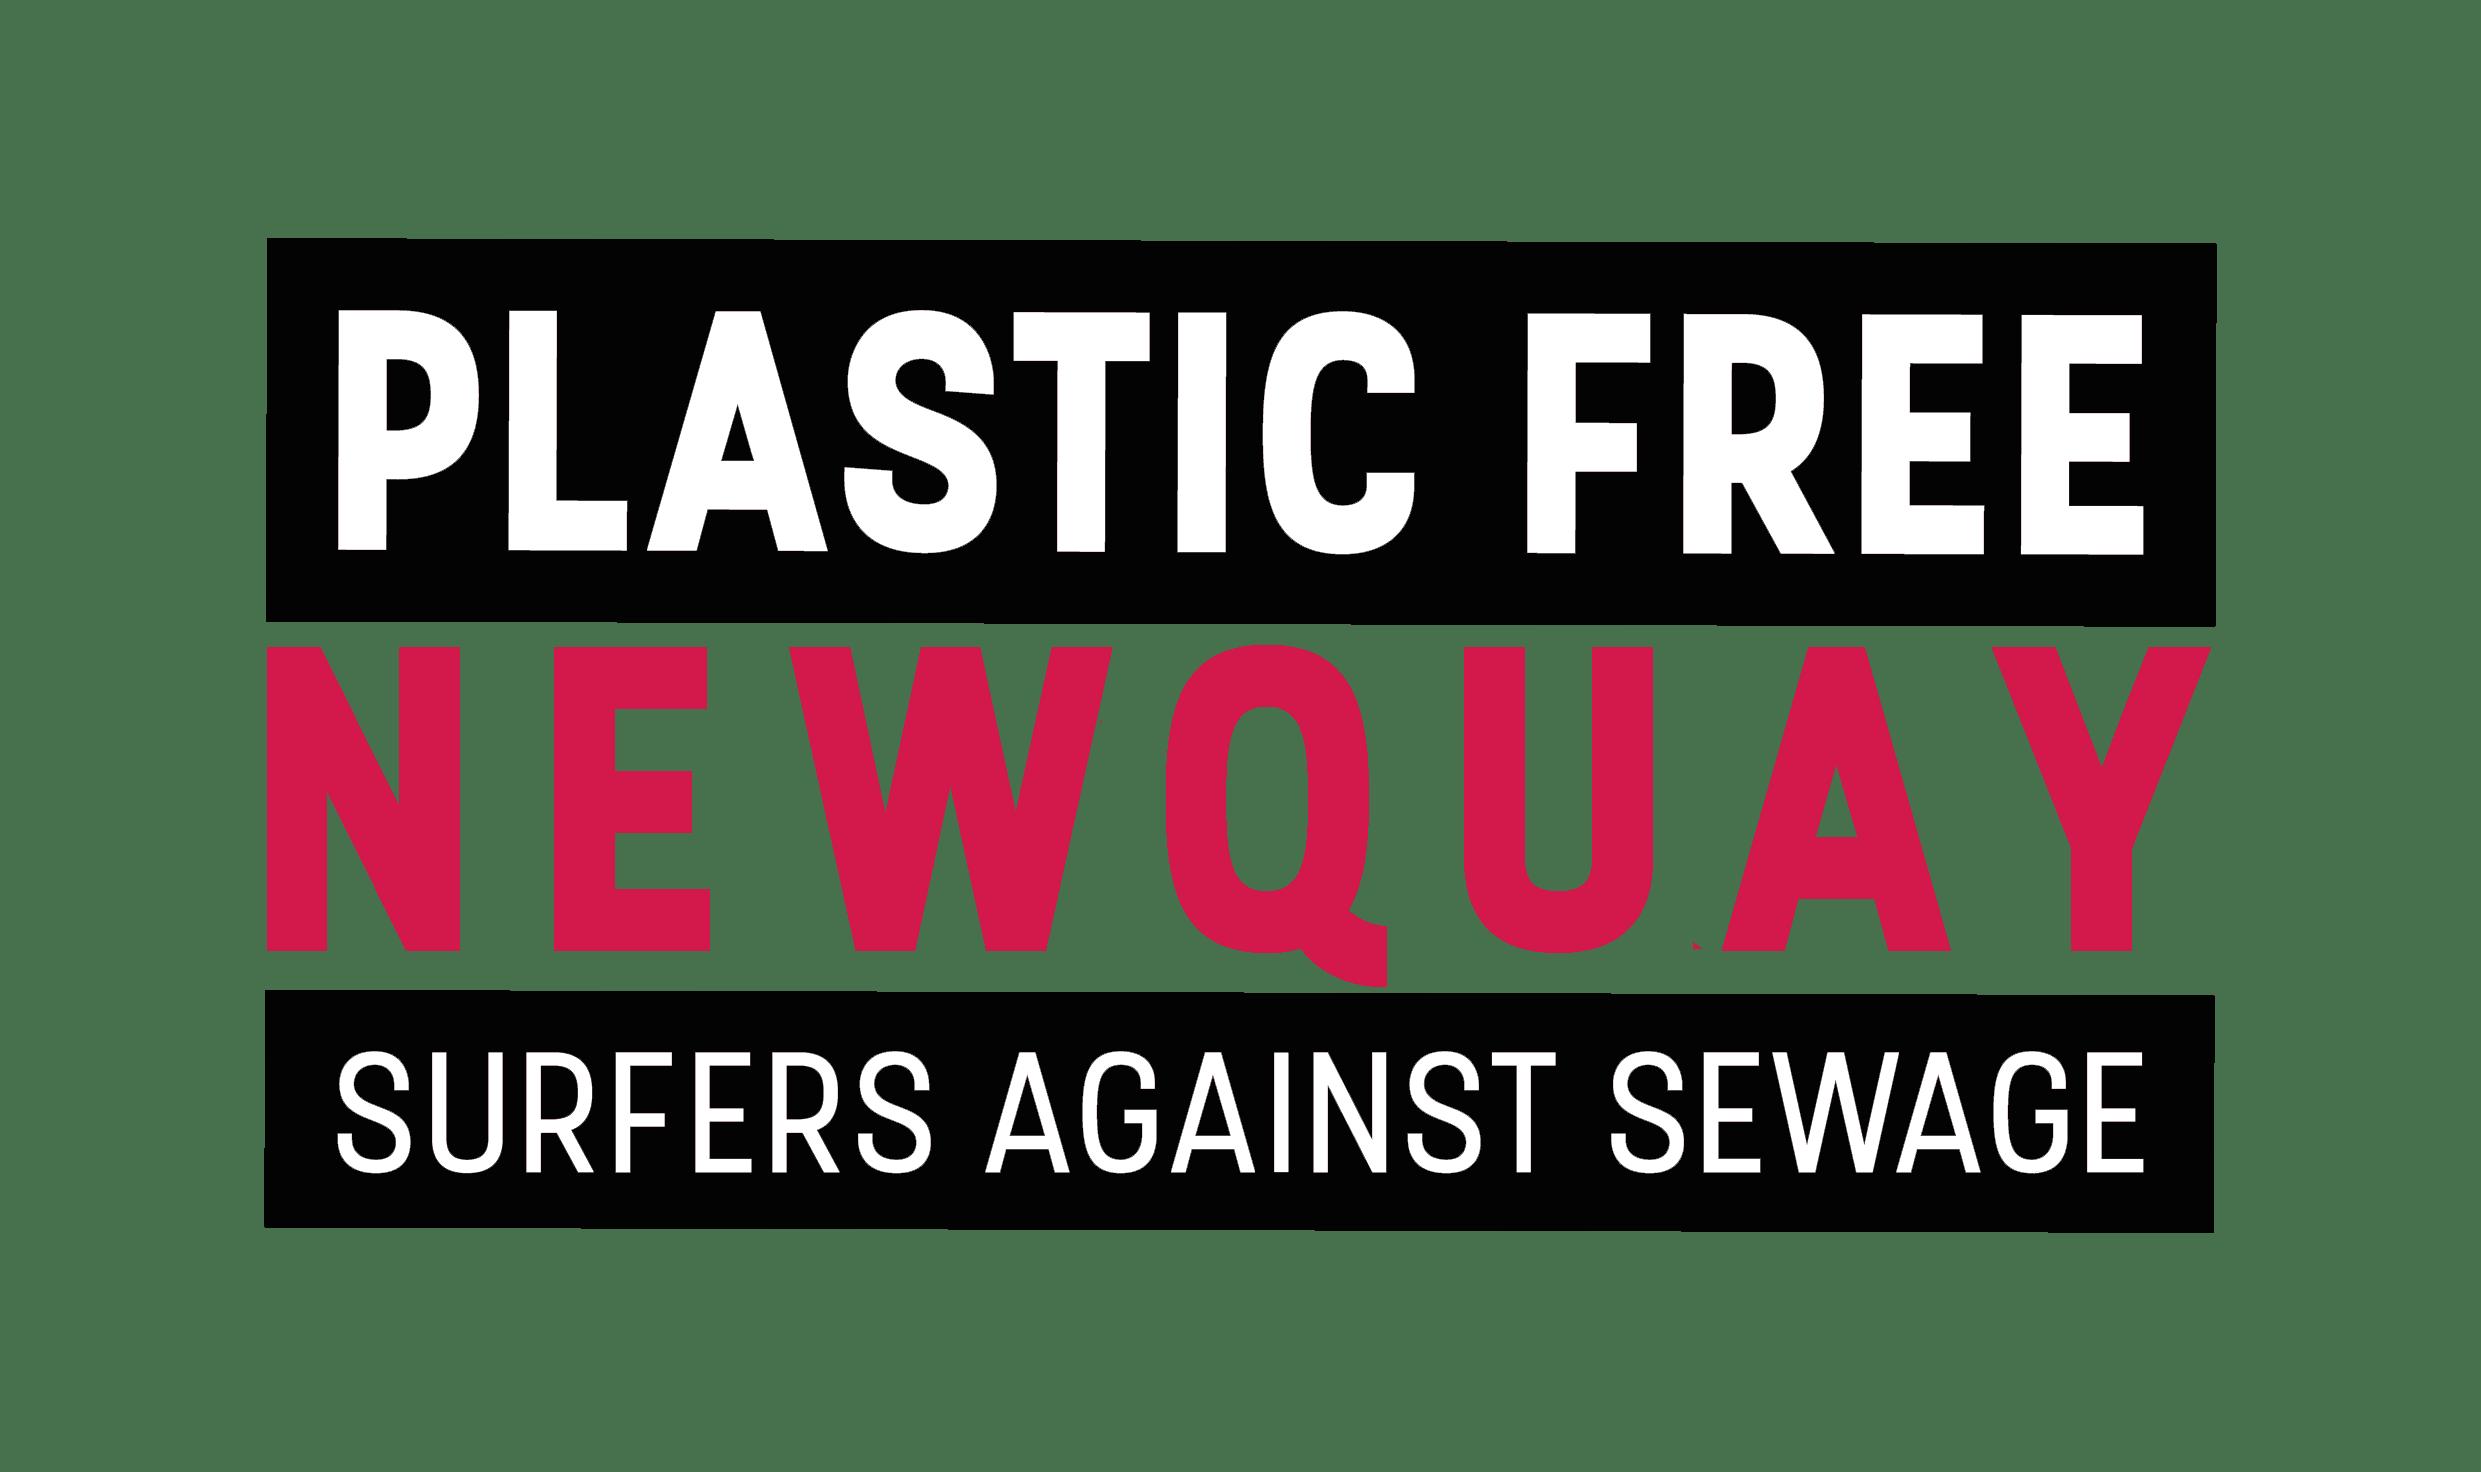 Plastic Free Newquay